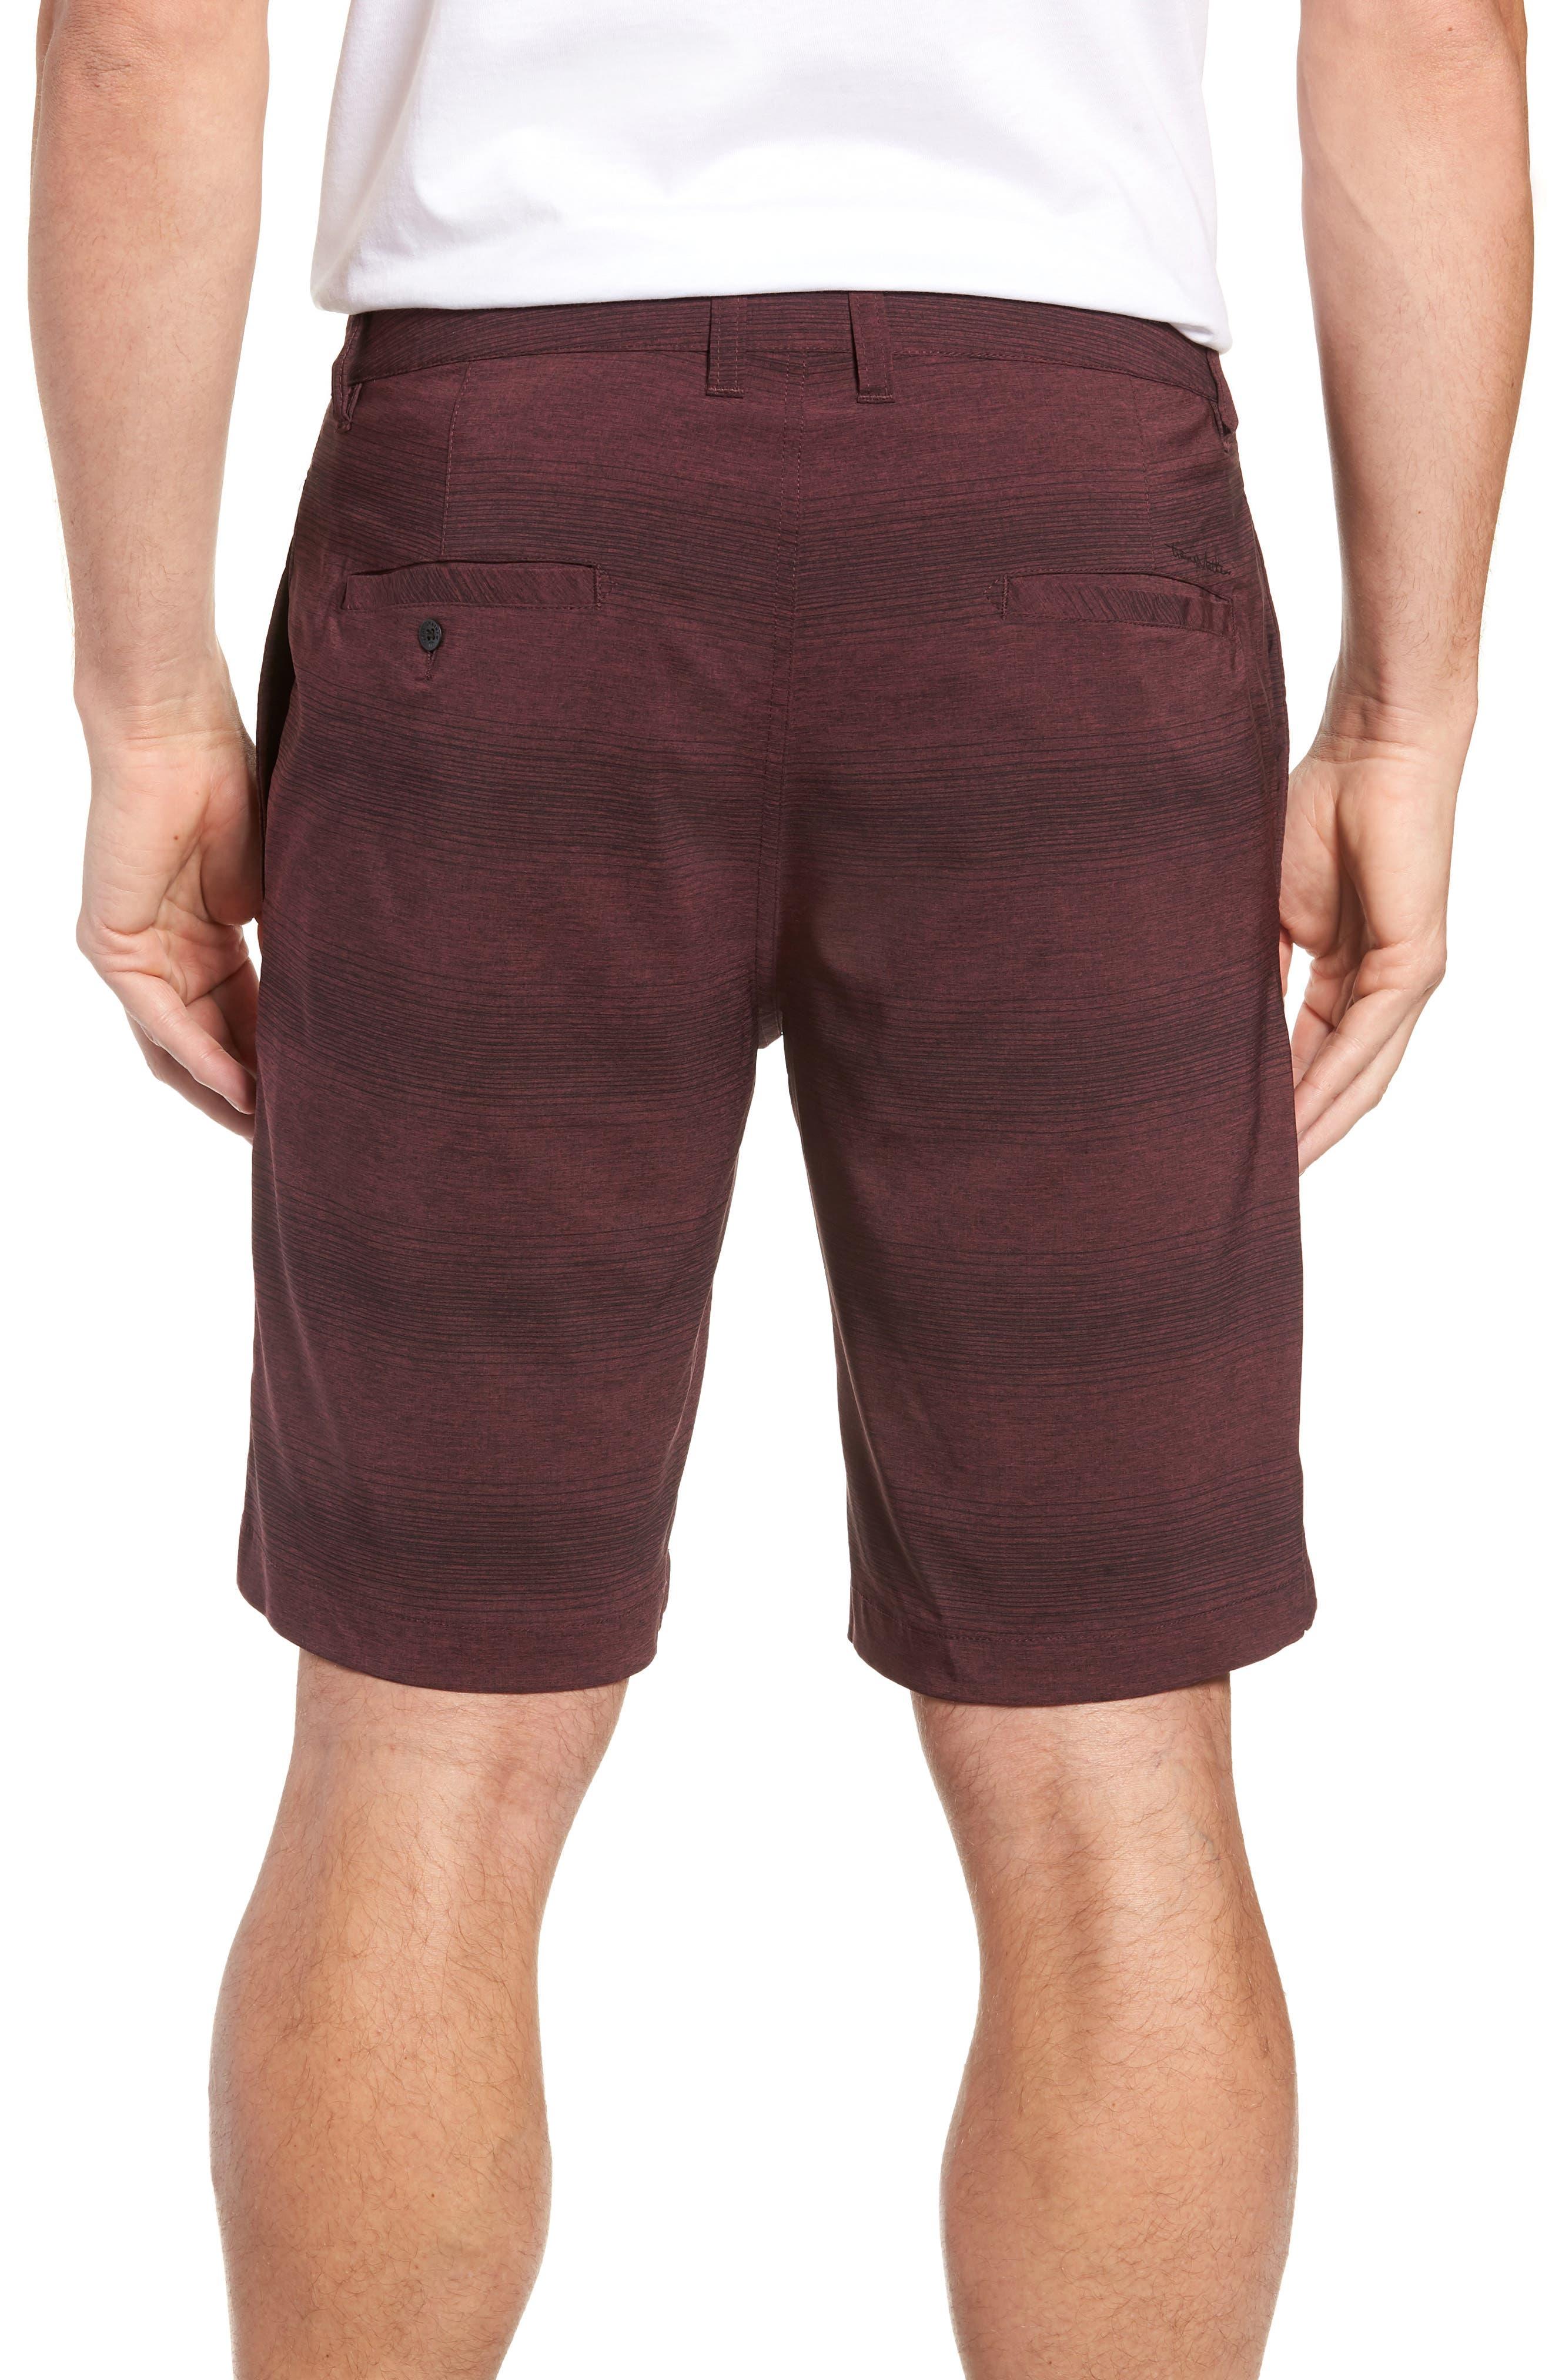 TRAVISMATHEW, Tepic Shorts, Alternate thumbnail 2, color, WINETASTING/ BLACK